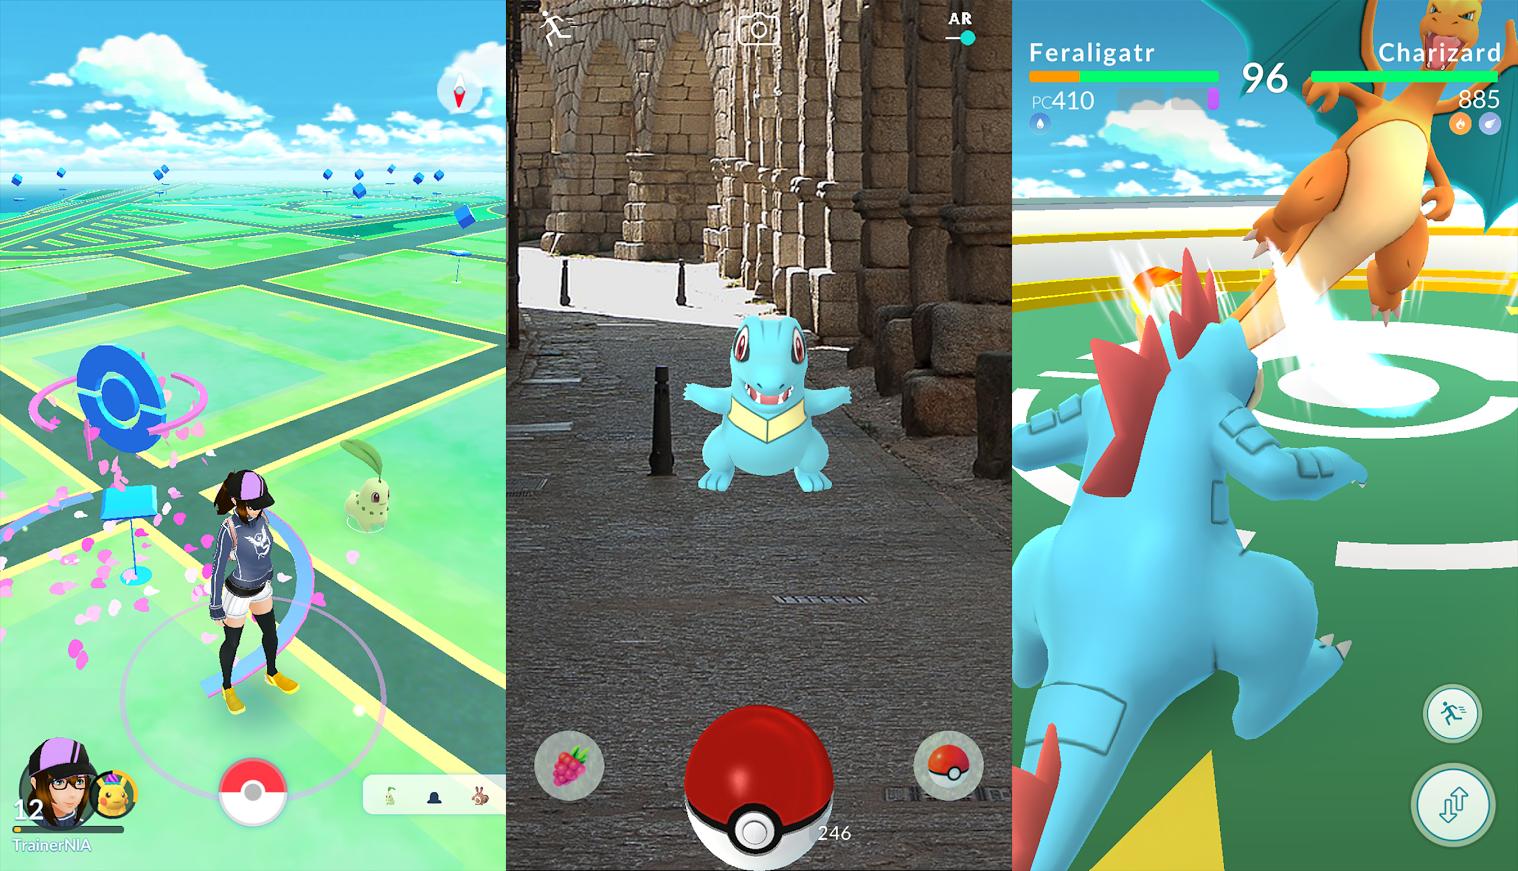 Imágenes de Pokémon GO